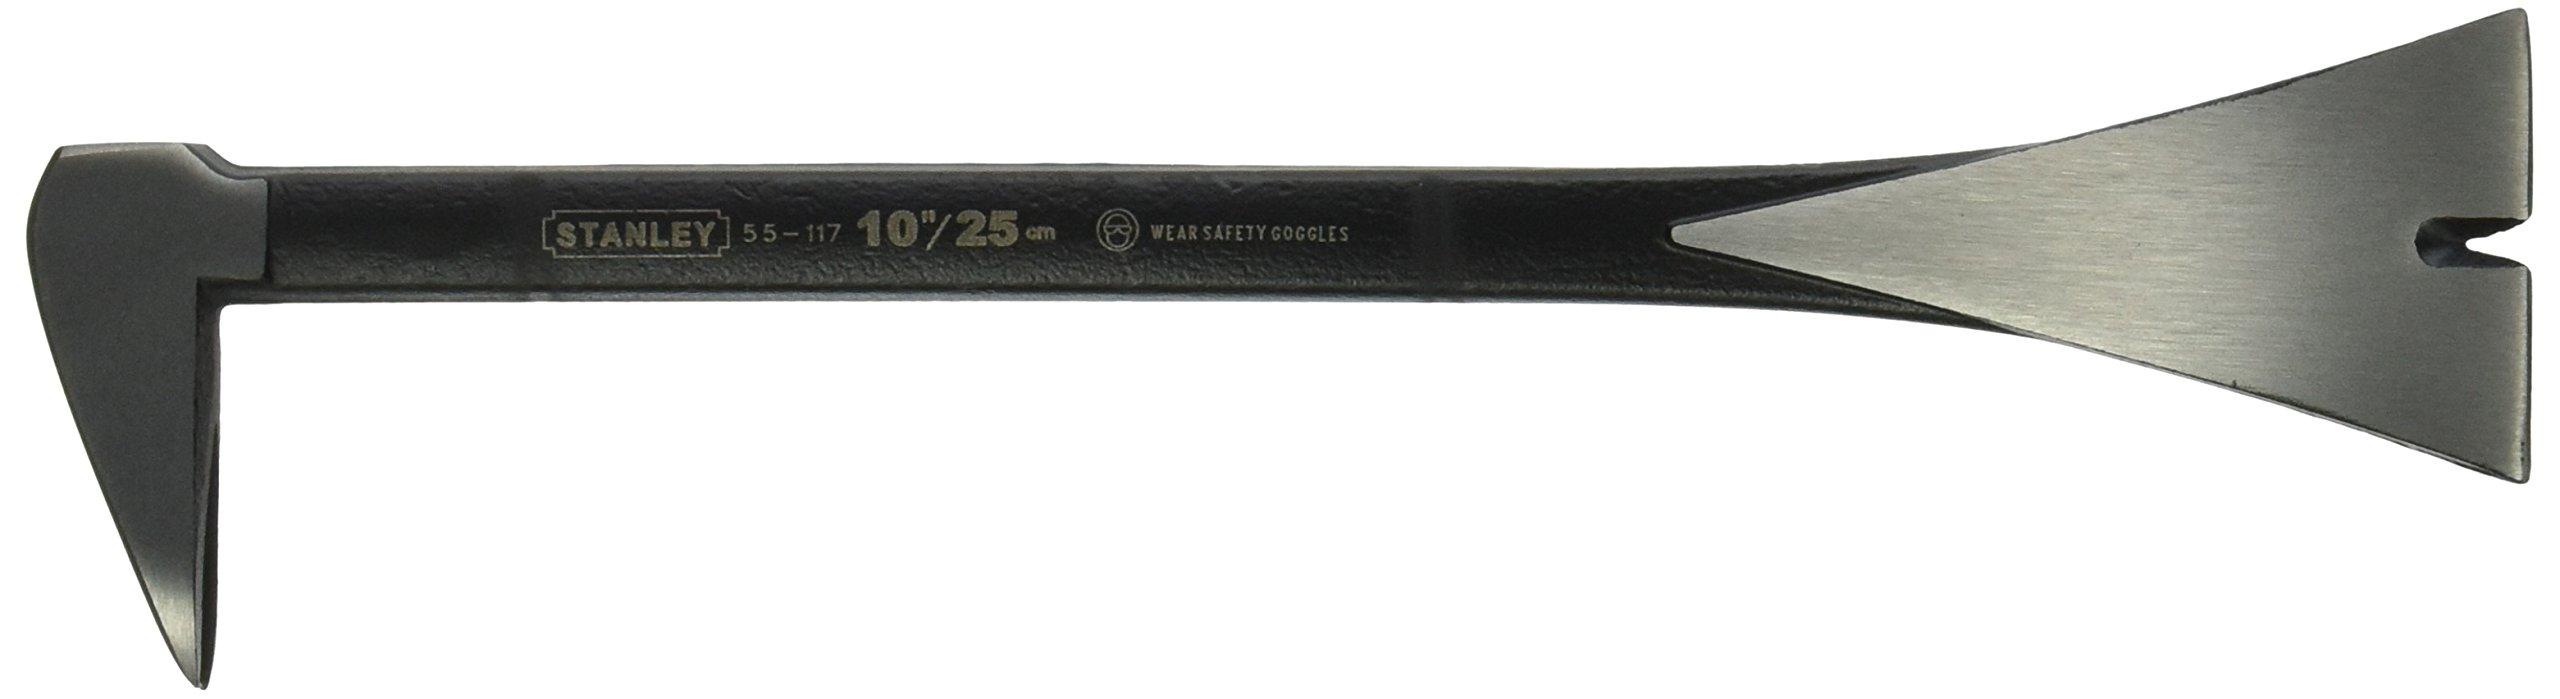 Stanley 55-117 10-Inch Molding Bar